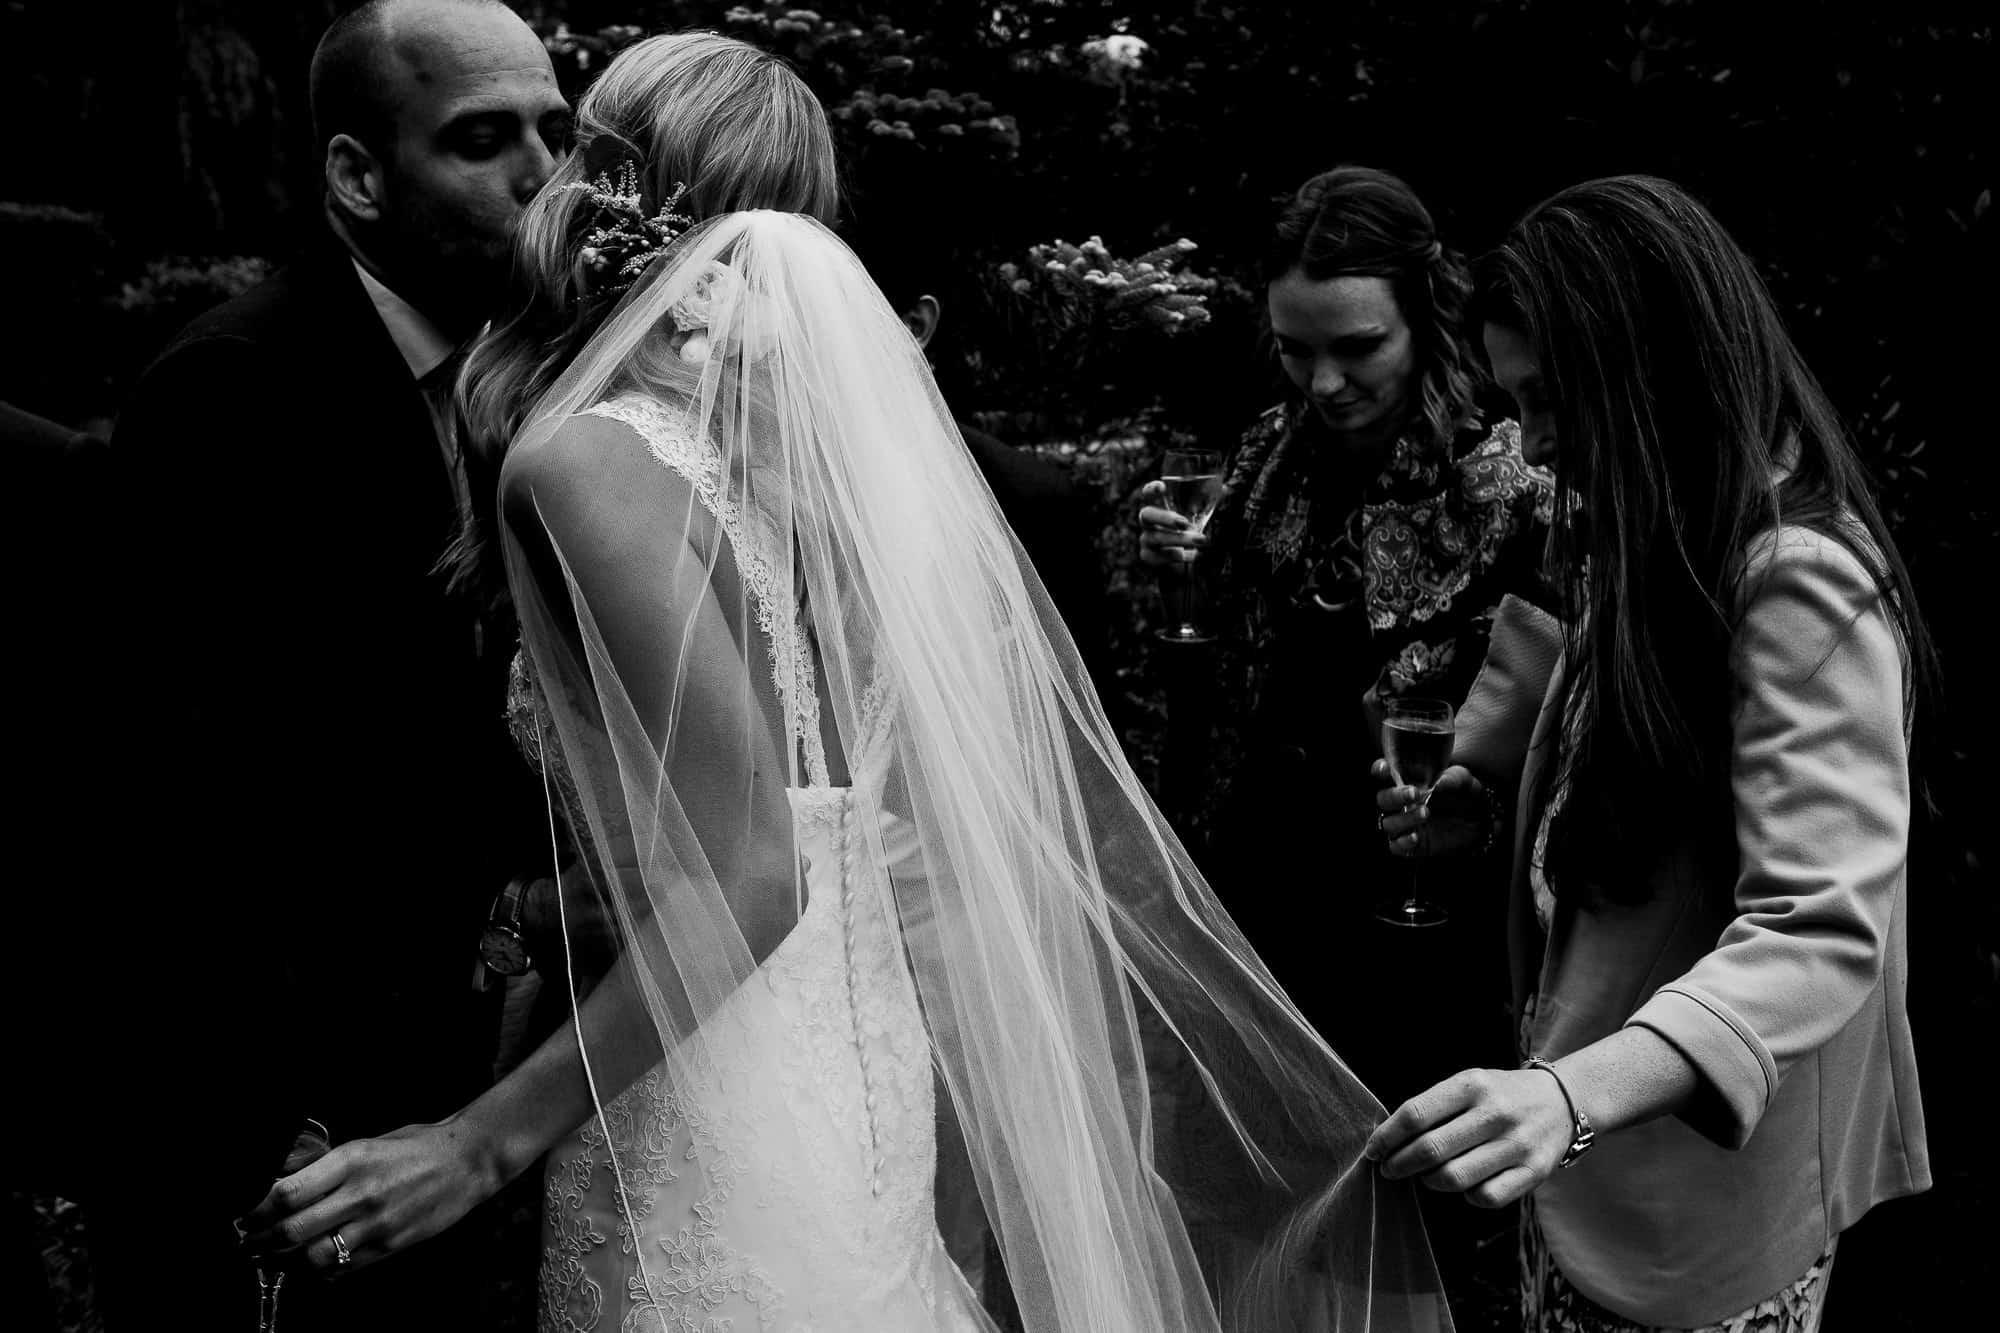 marleybrook-house-wedding-photography-matt-tyler-0036